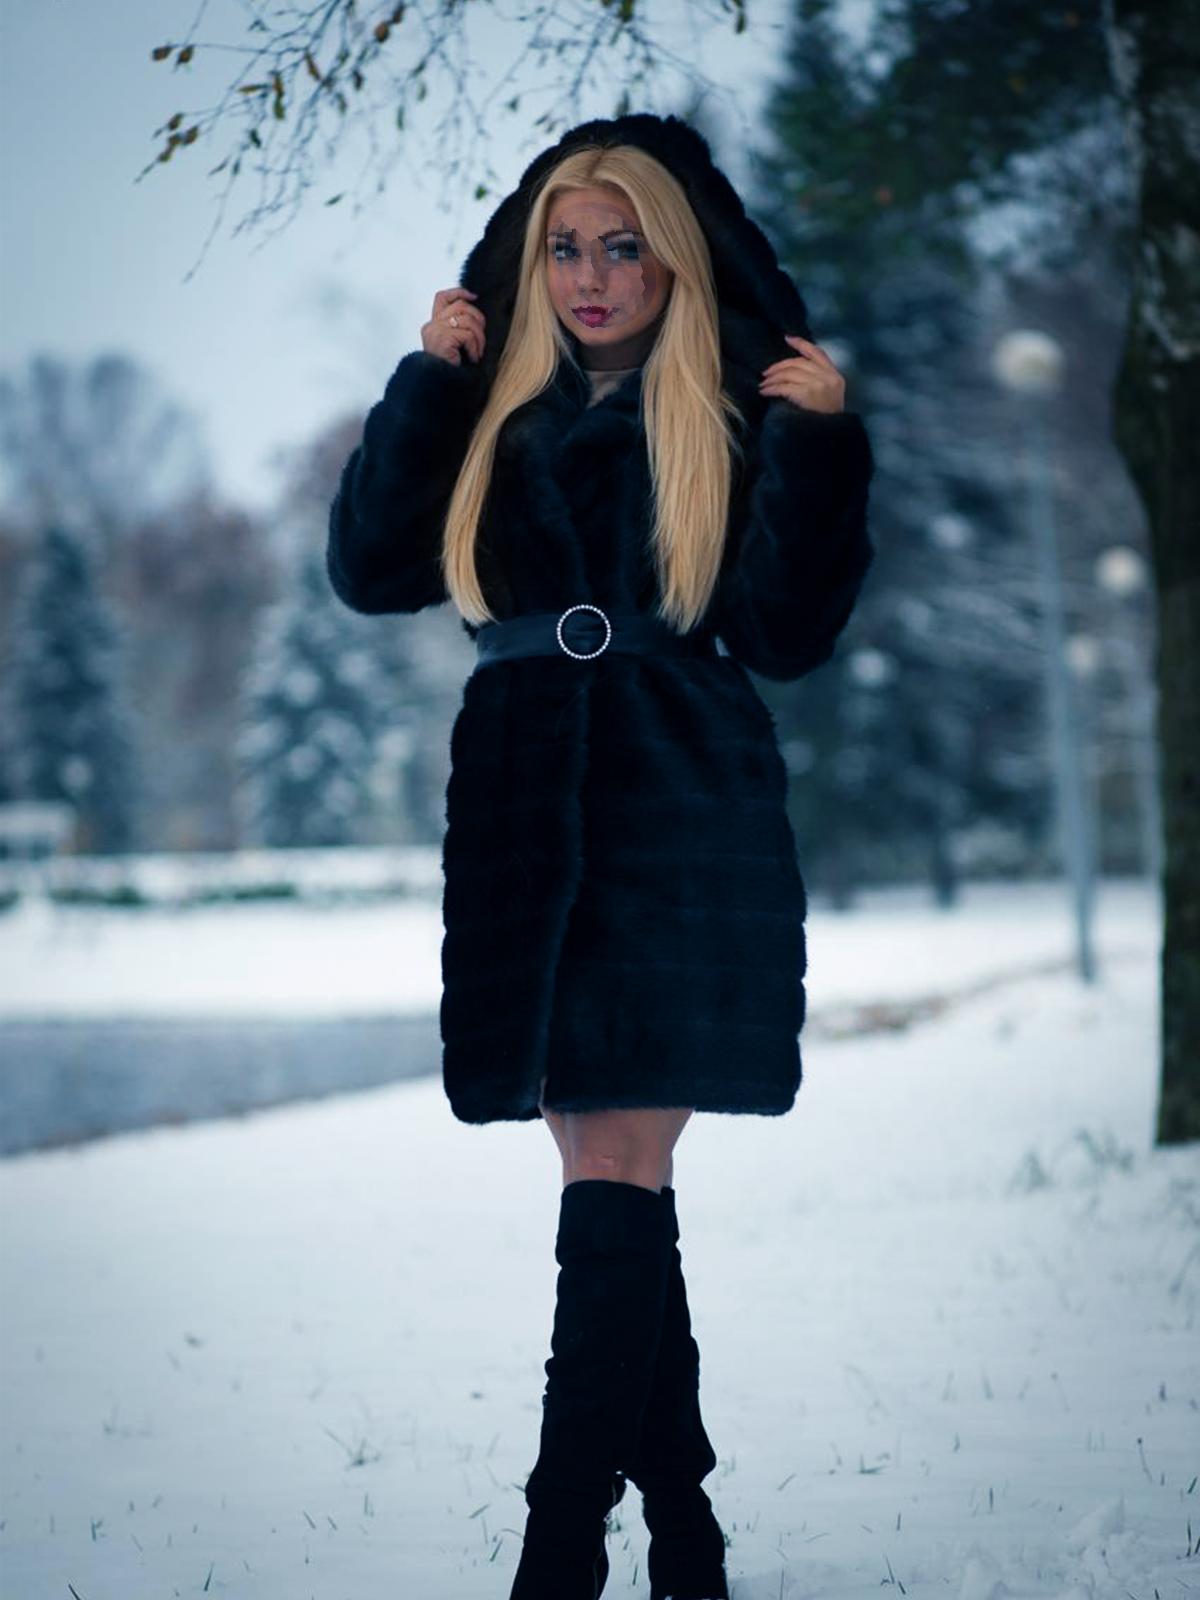 Фоторамка Девушка в черной, короткой шубе Фоторамка для фотошопа, PNG шаблон.